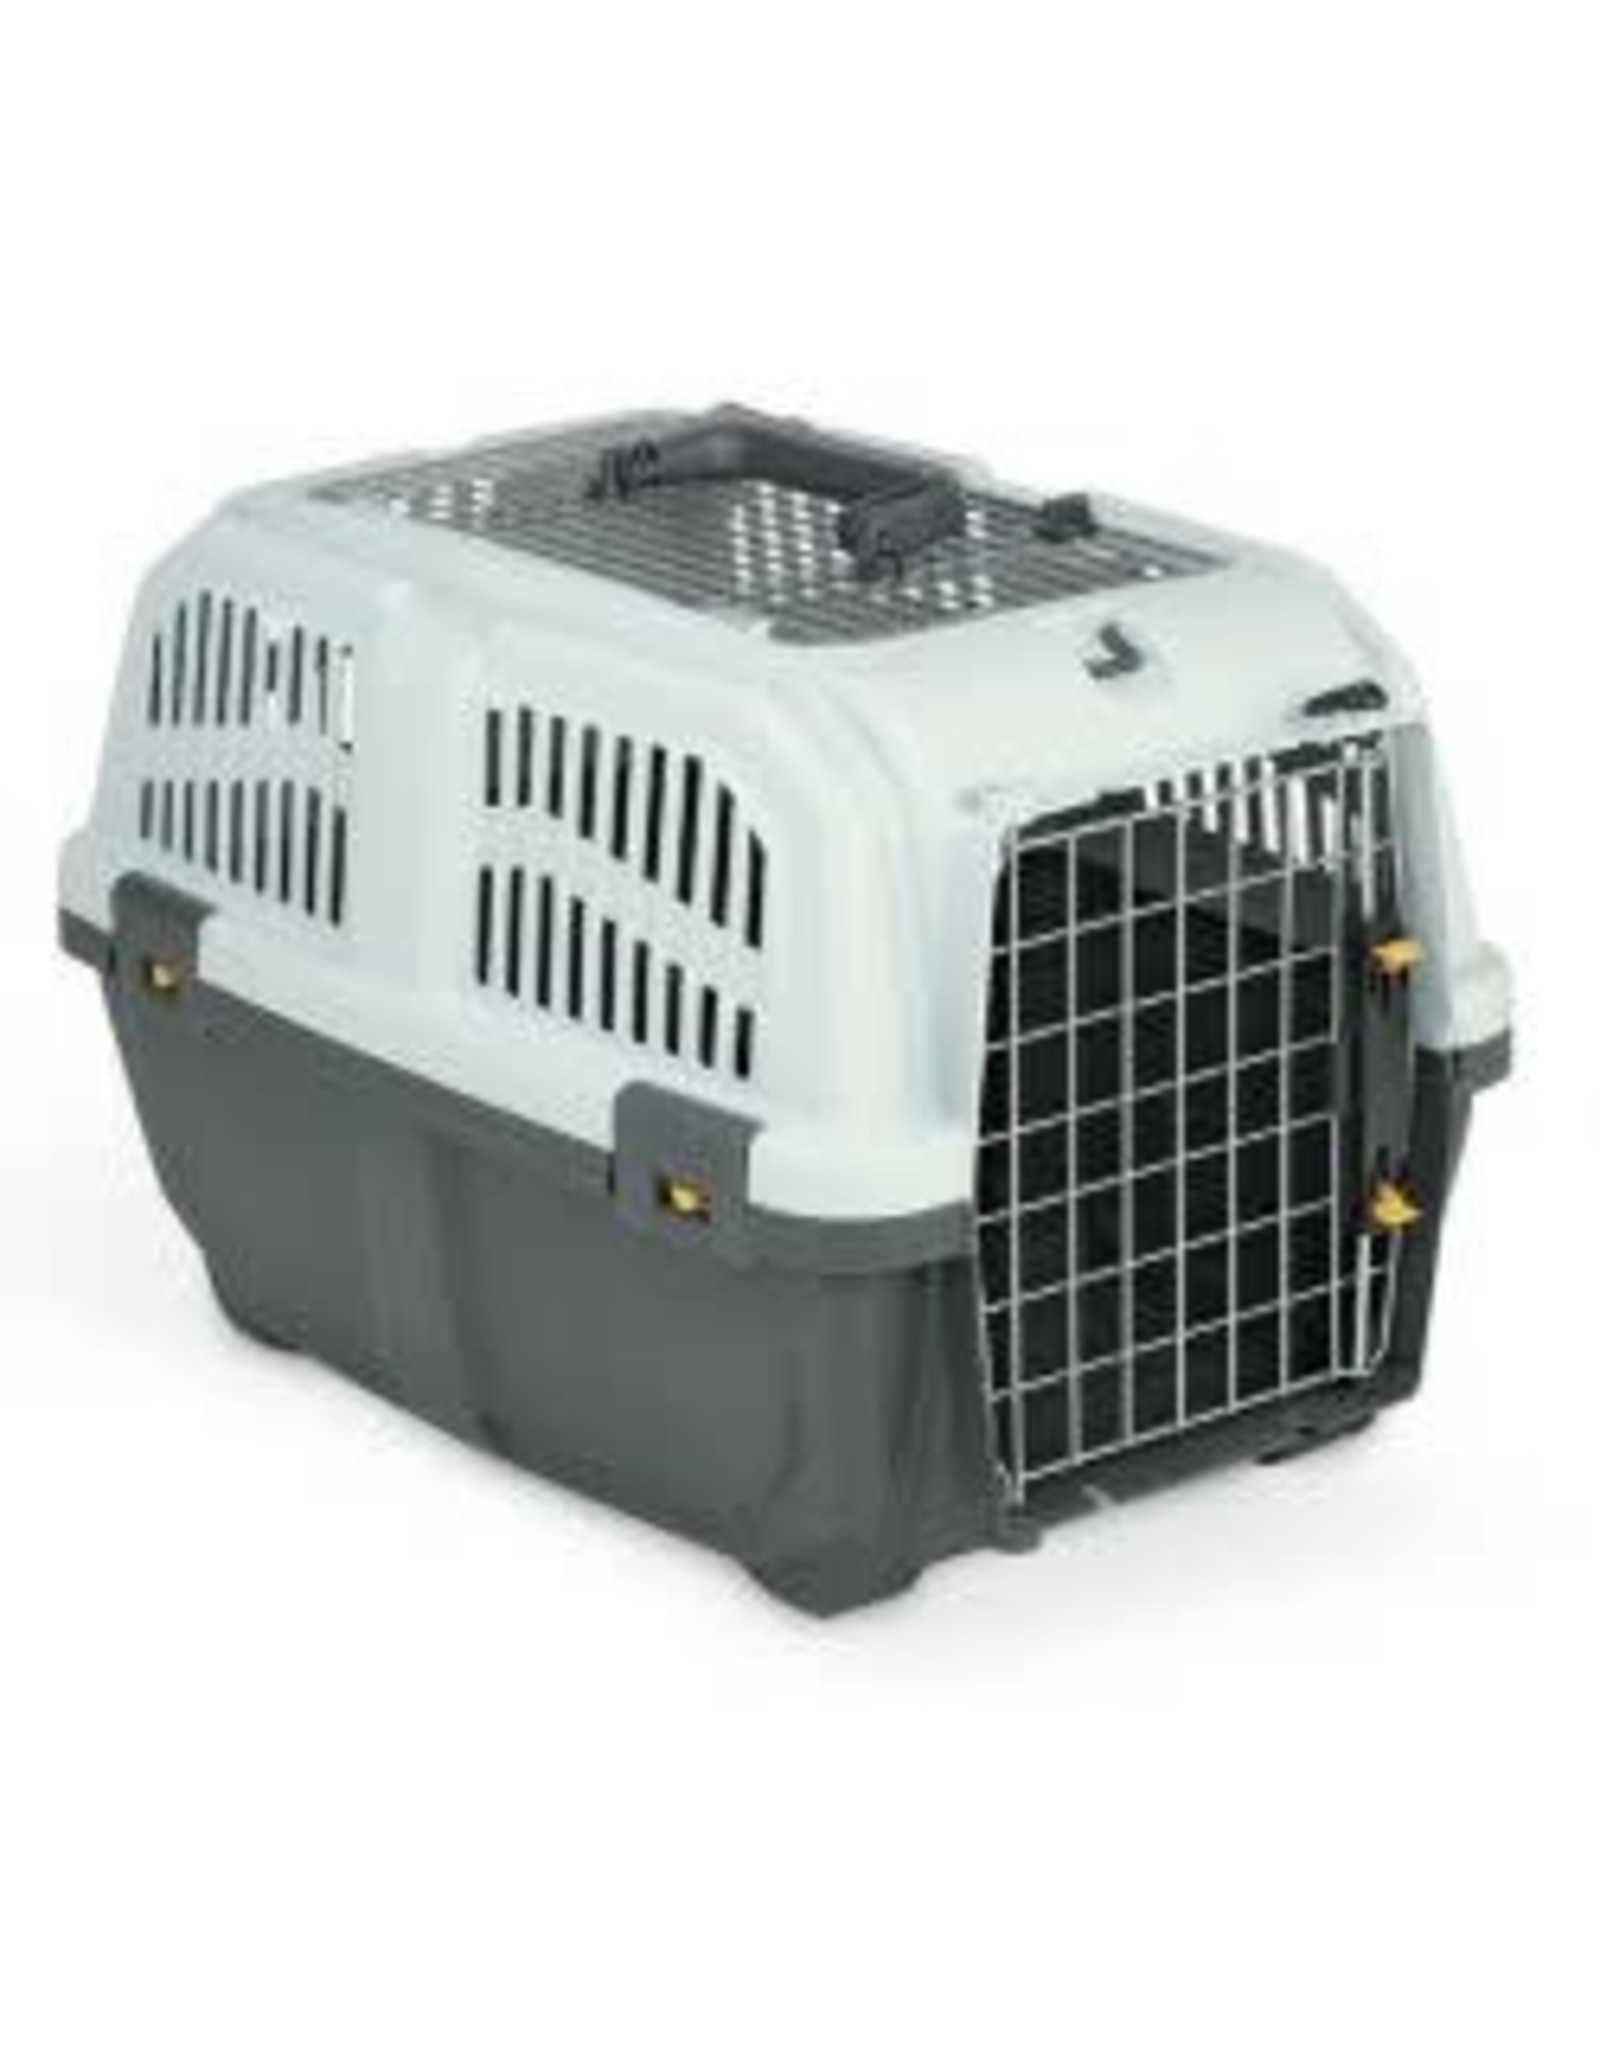 Skudo Skudo Open Top Pet Carrier 48cm